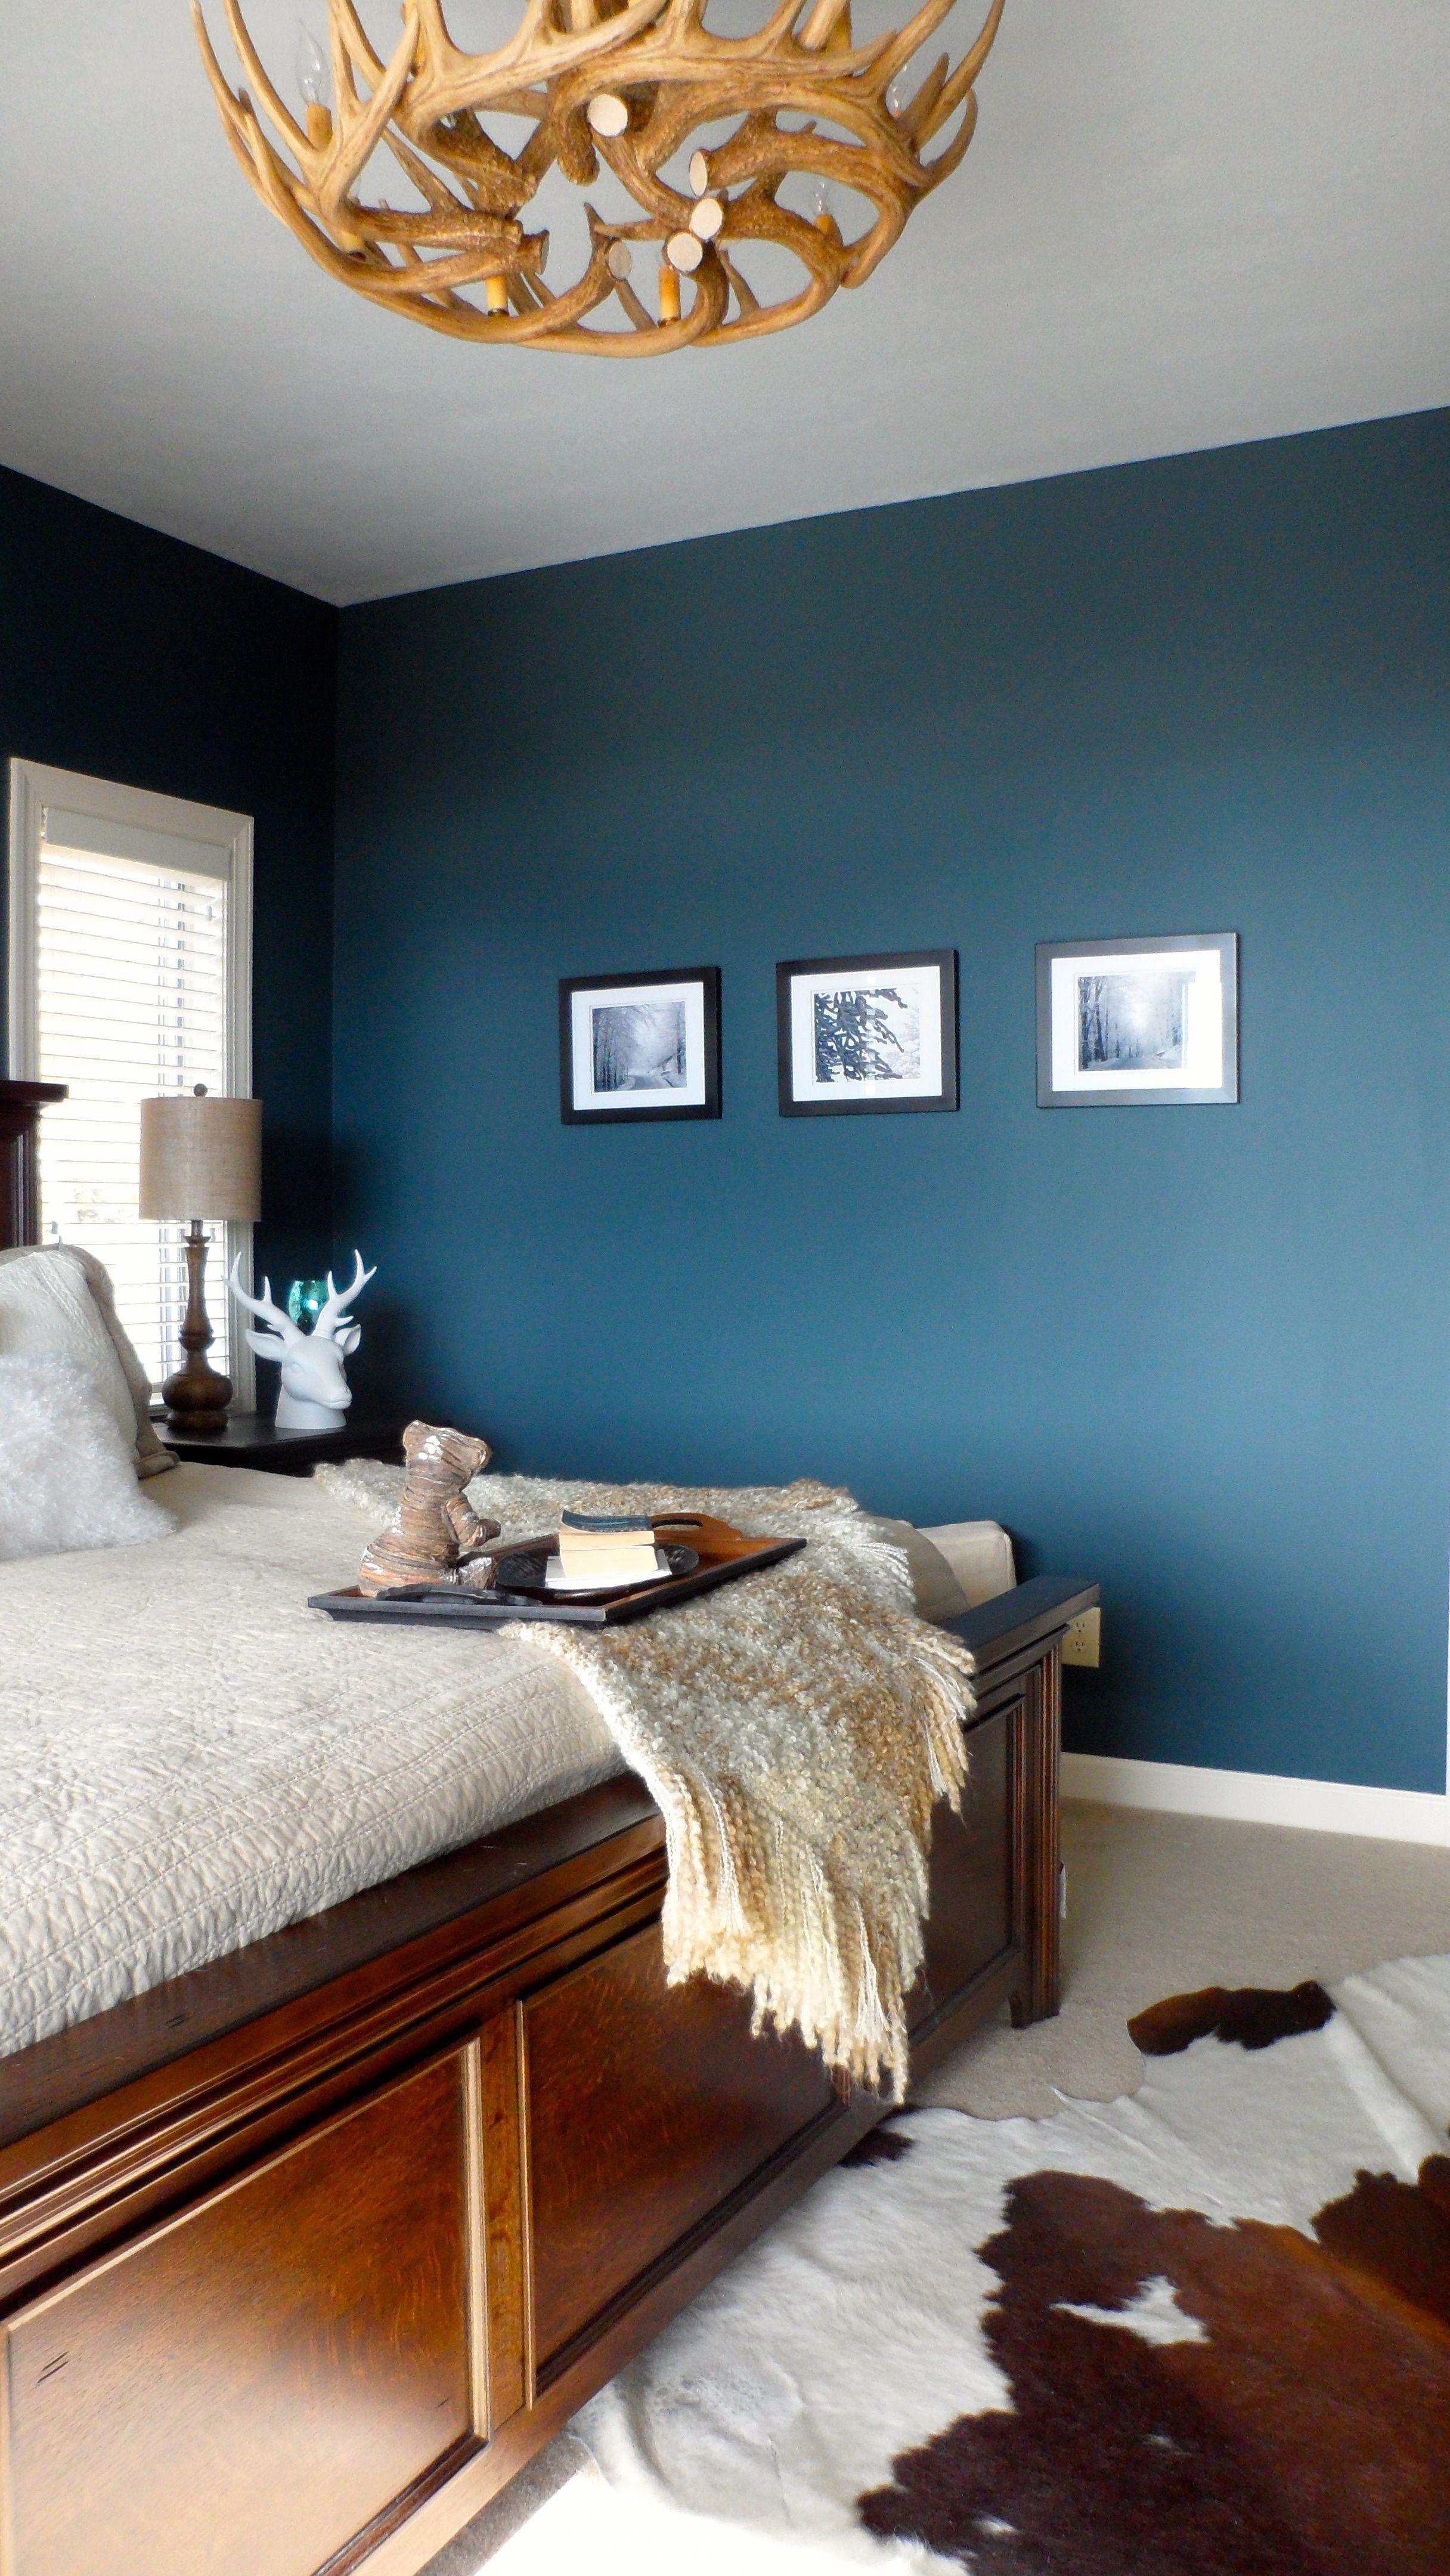 wall color rusticbedroom Rustic master bedroom, Bedroom